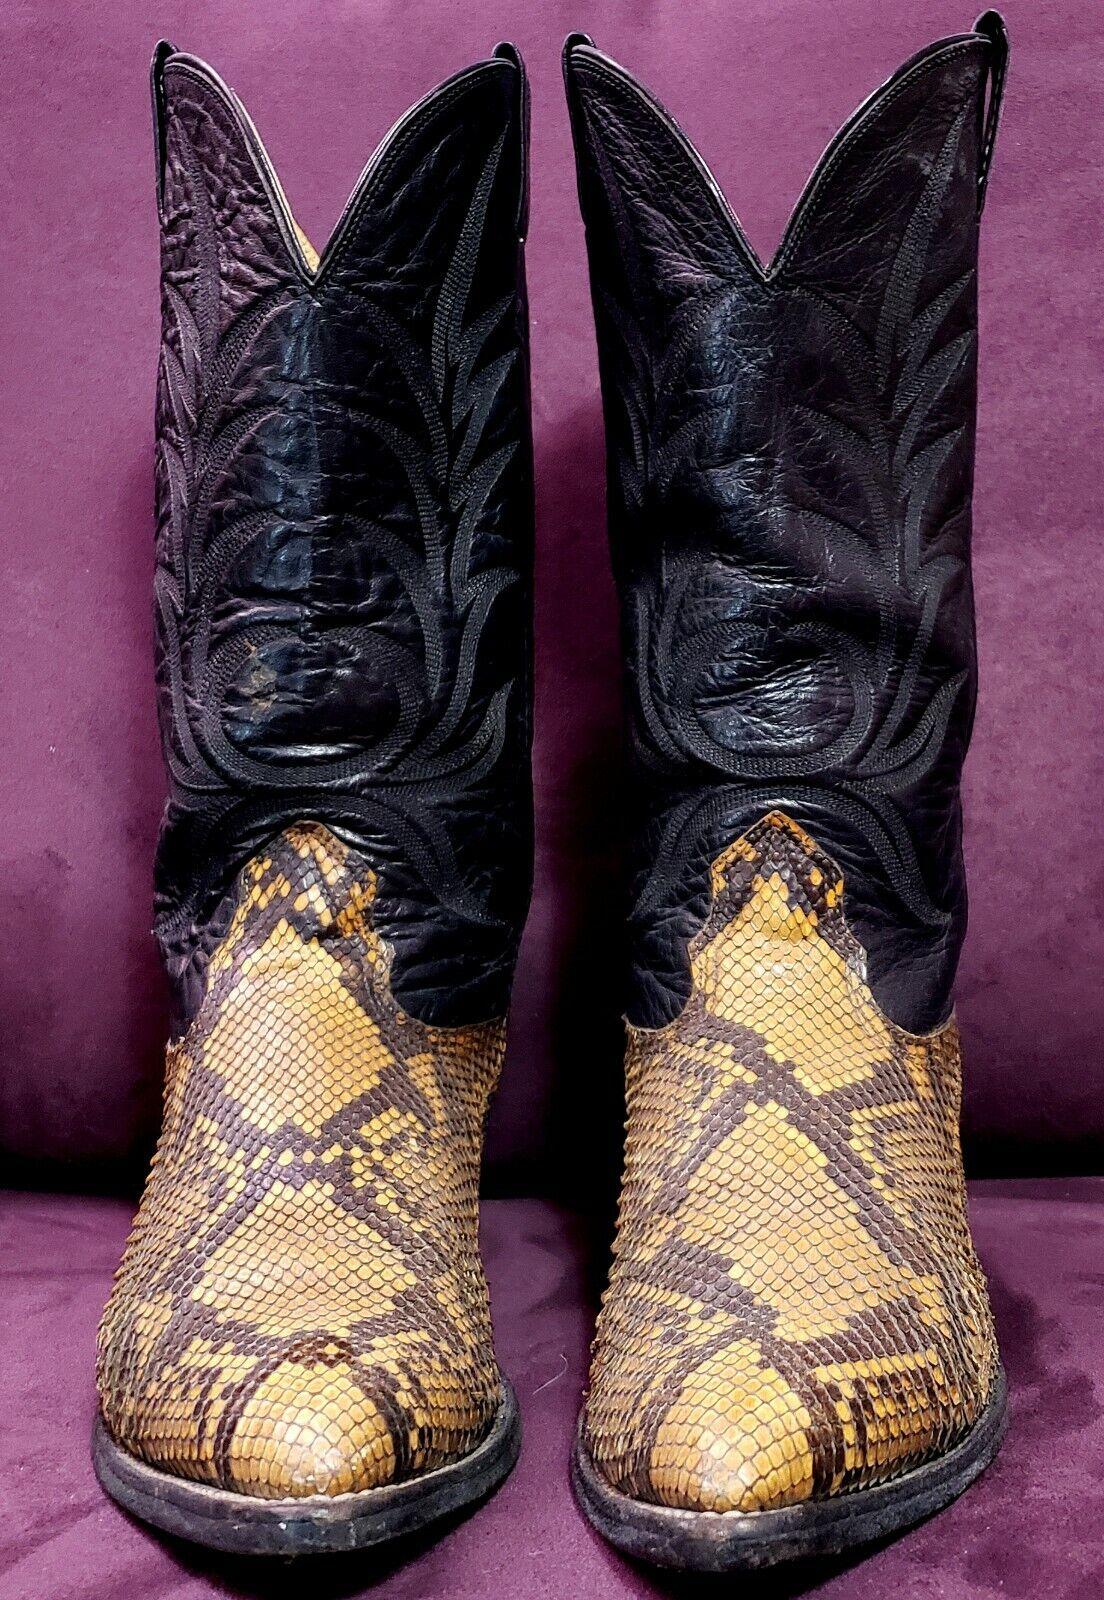 NOCONA Snakeskin Western Cowboy Boots,9D, USA